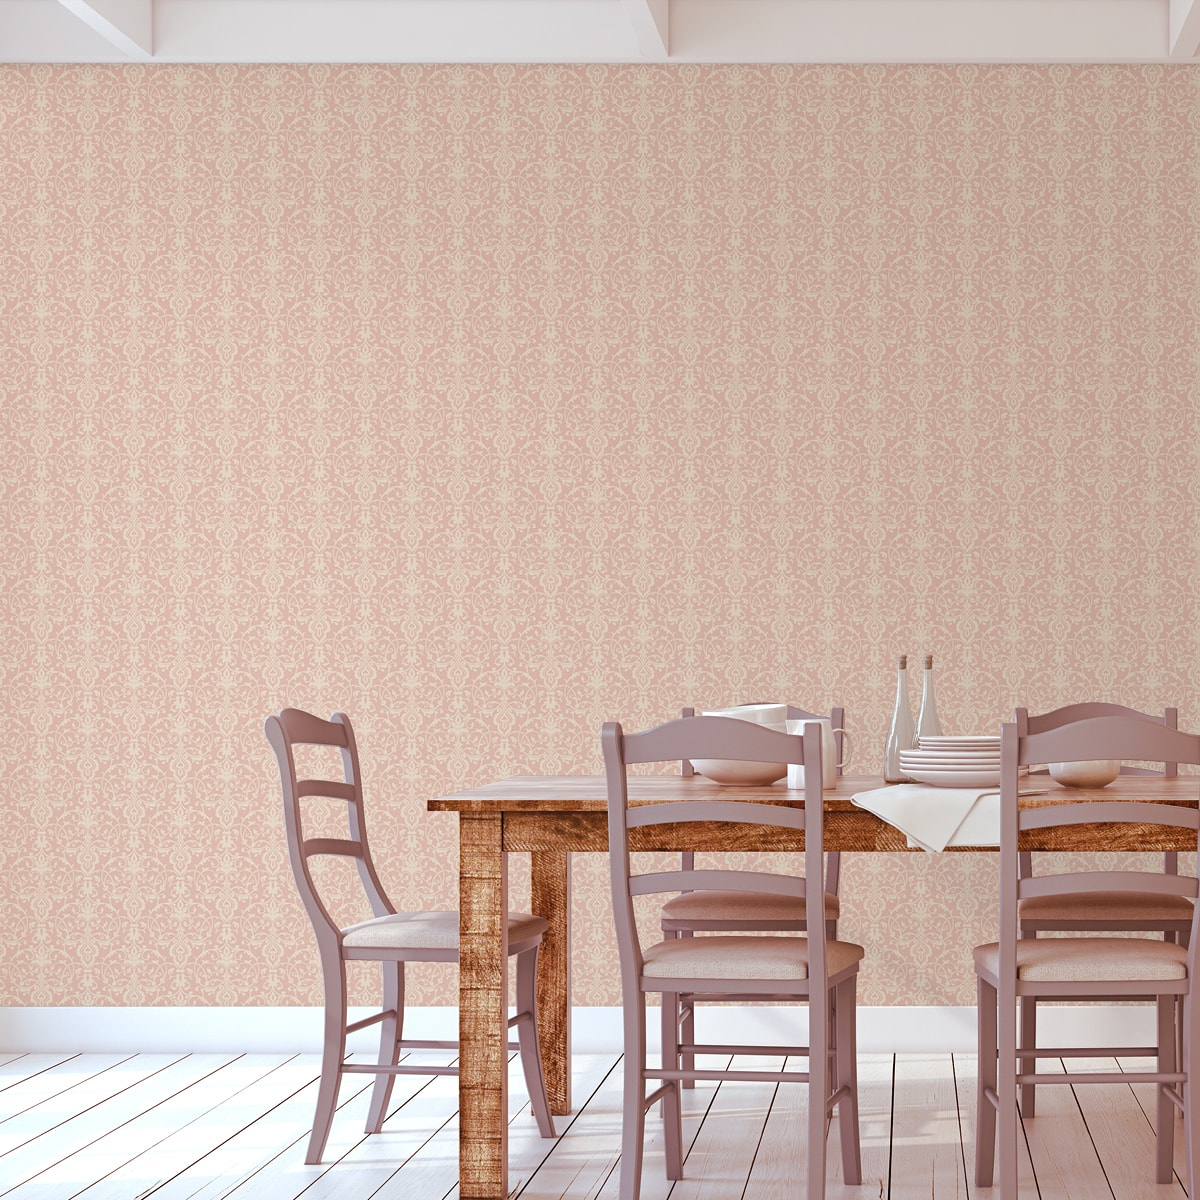 Wandtapete rosa: Ornamentale Tapete mit klassischem Damast Muster auf rosa angepasst an Little Greene Wandfarben- Vliestapete Ornamente